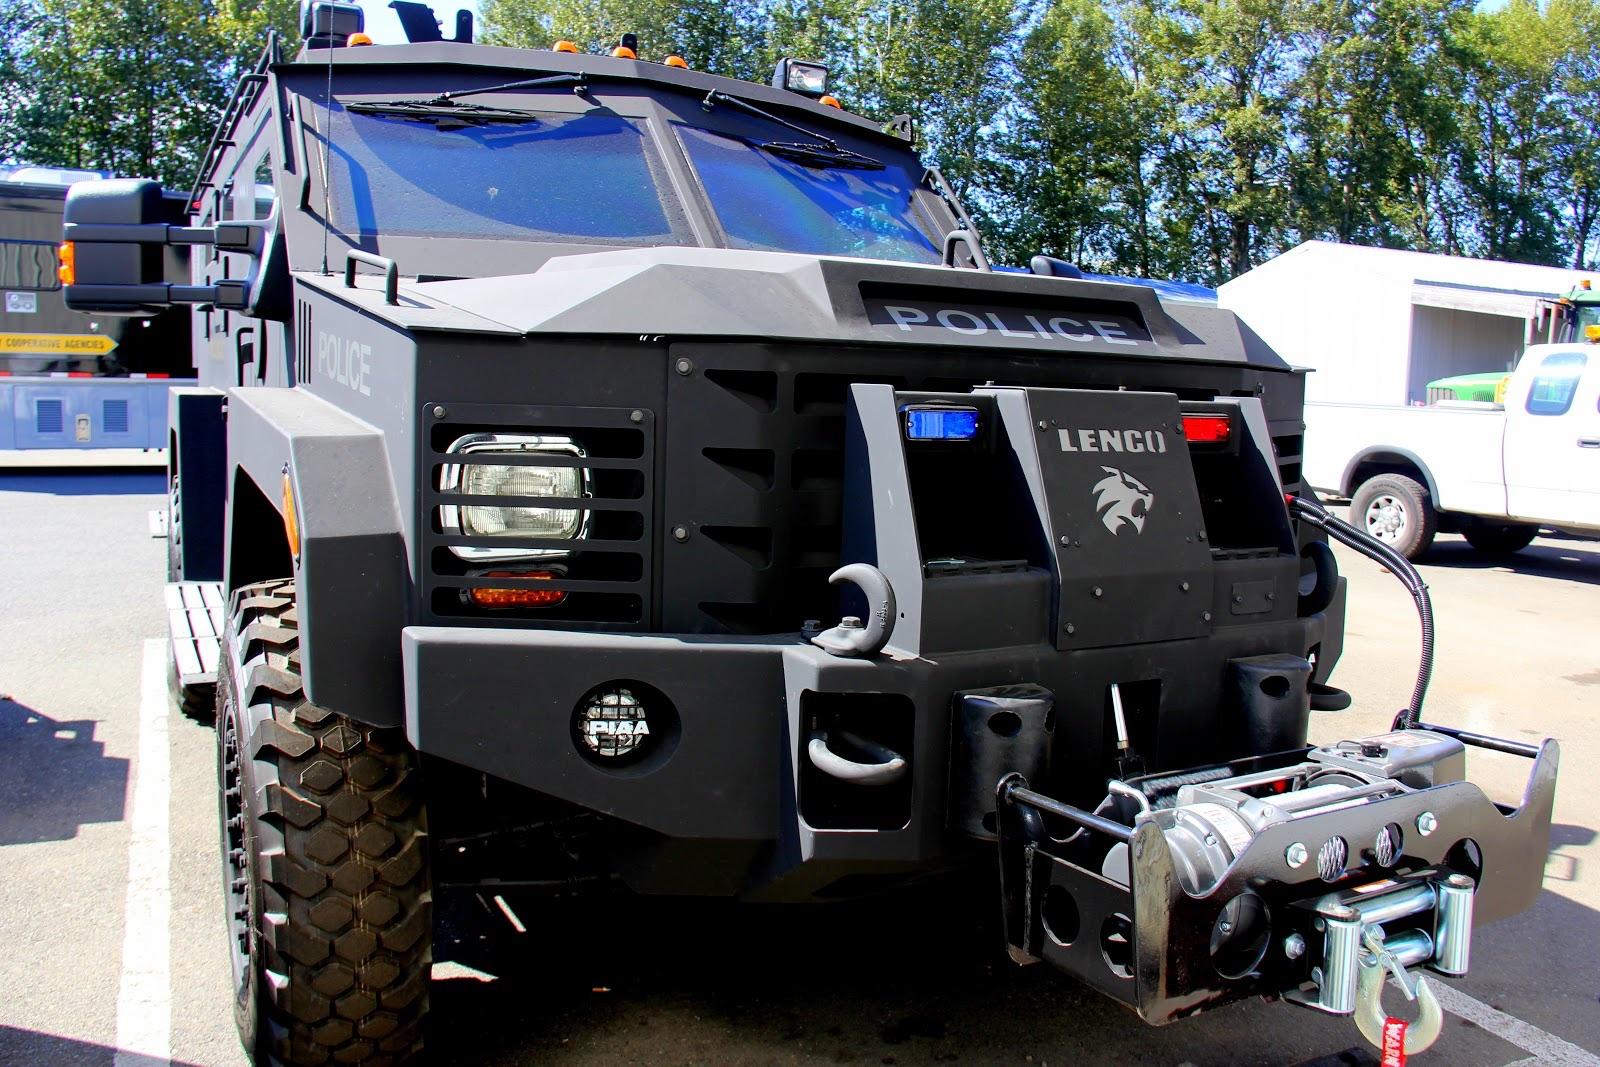 fife swat.jpg